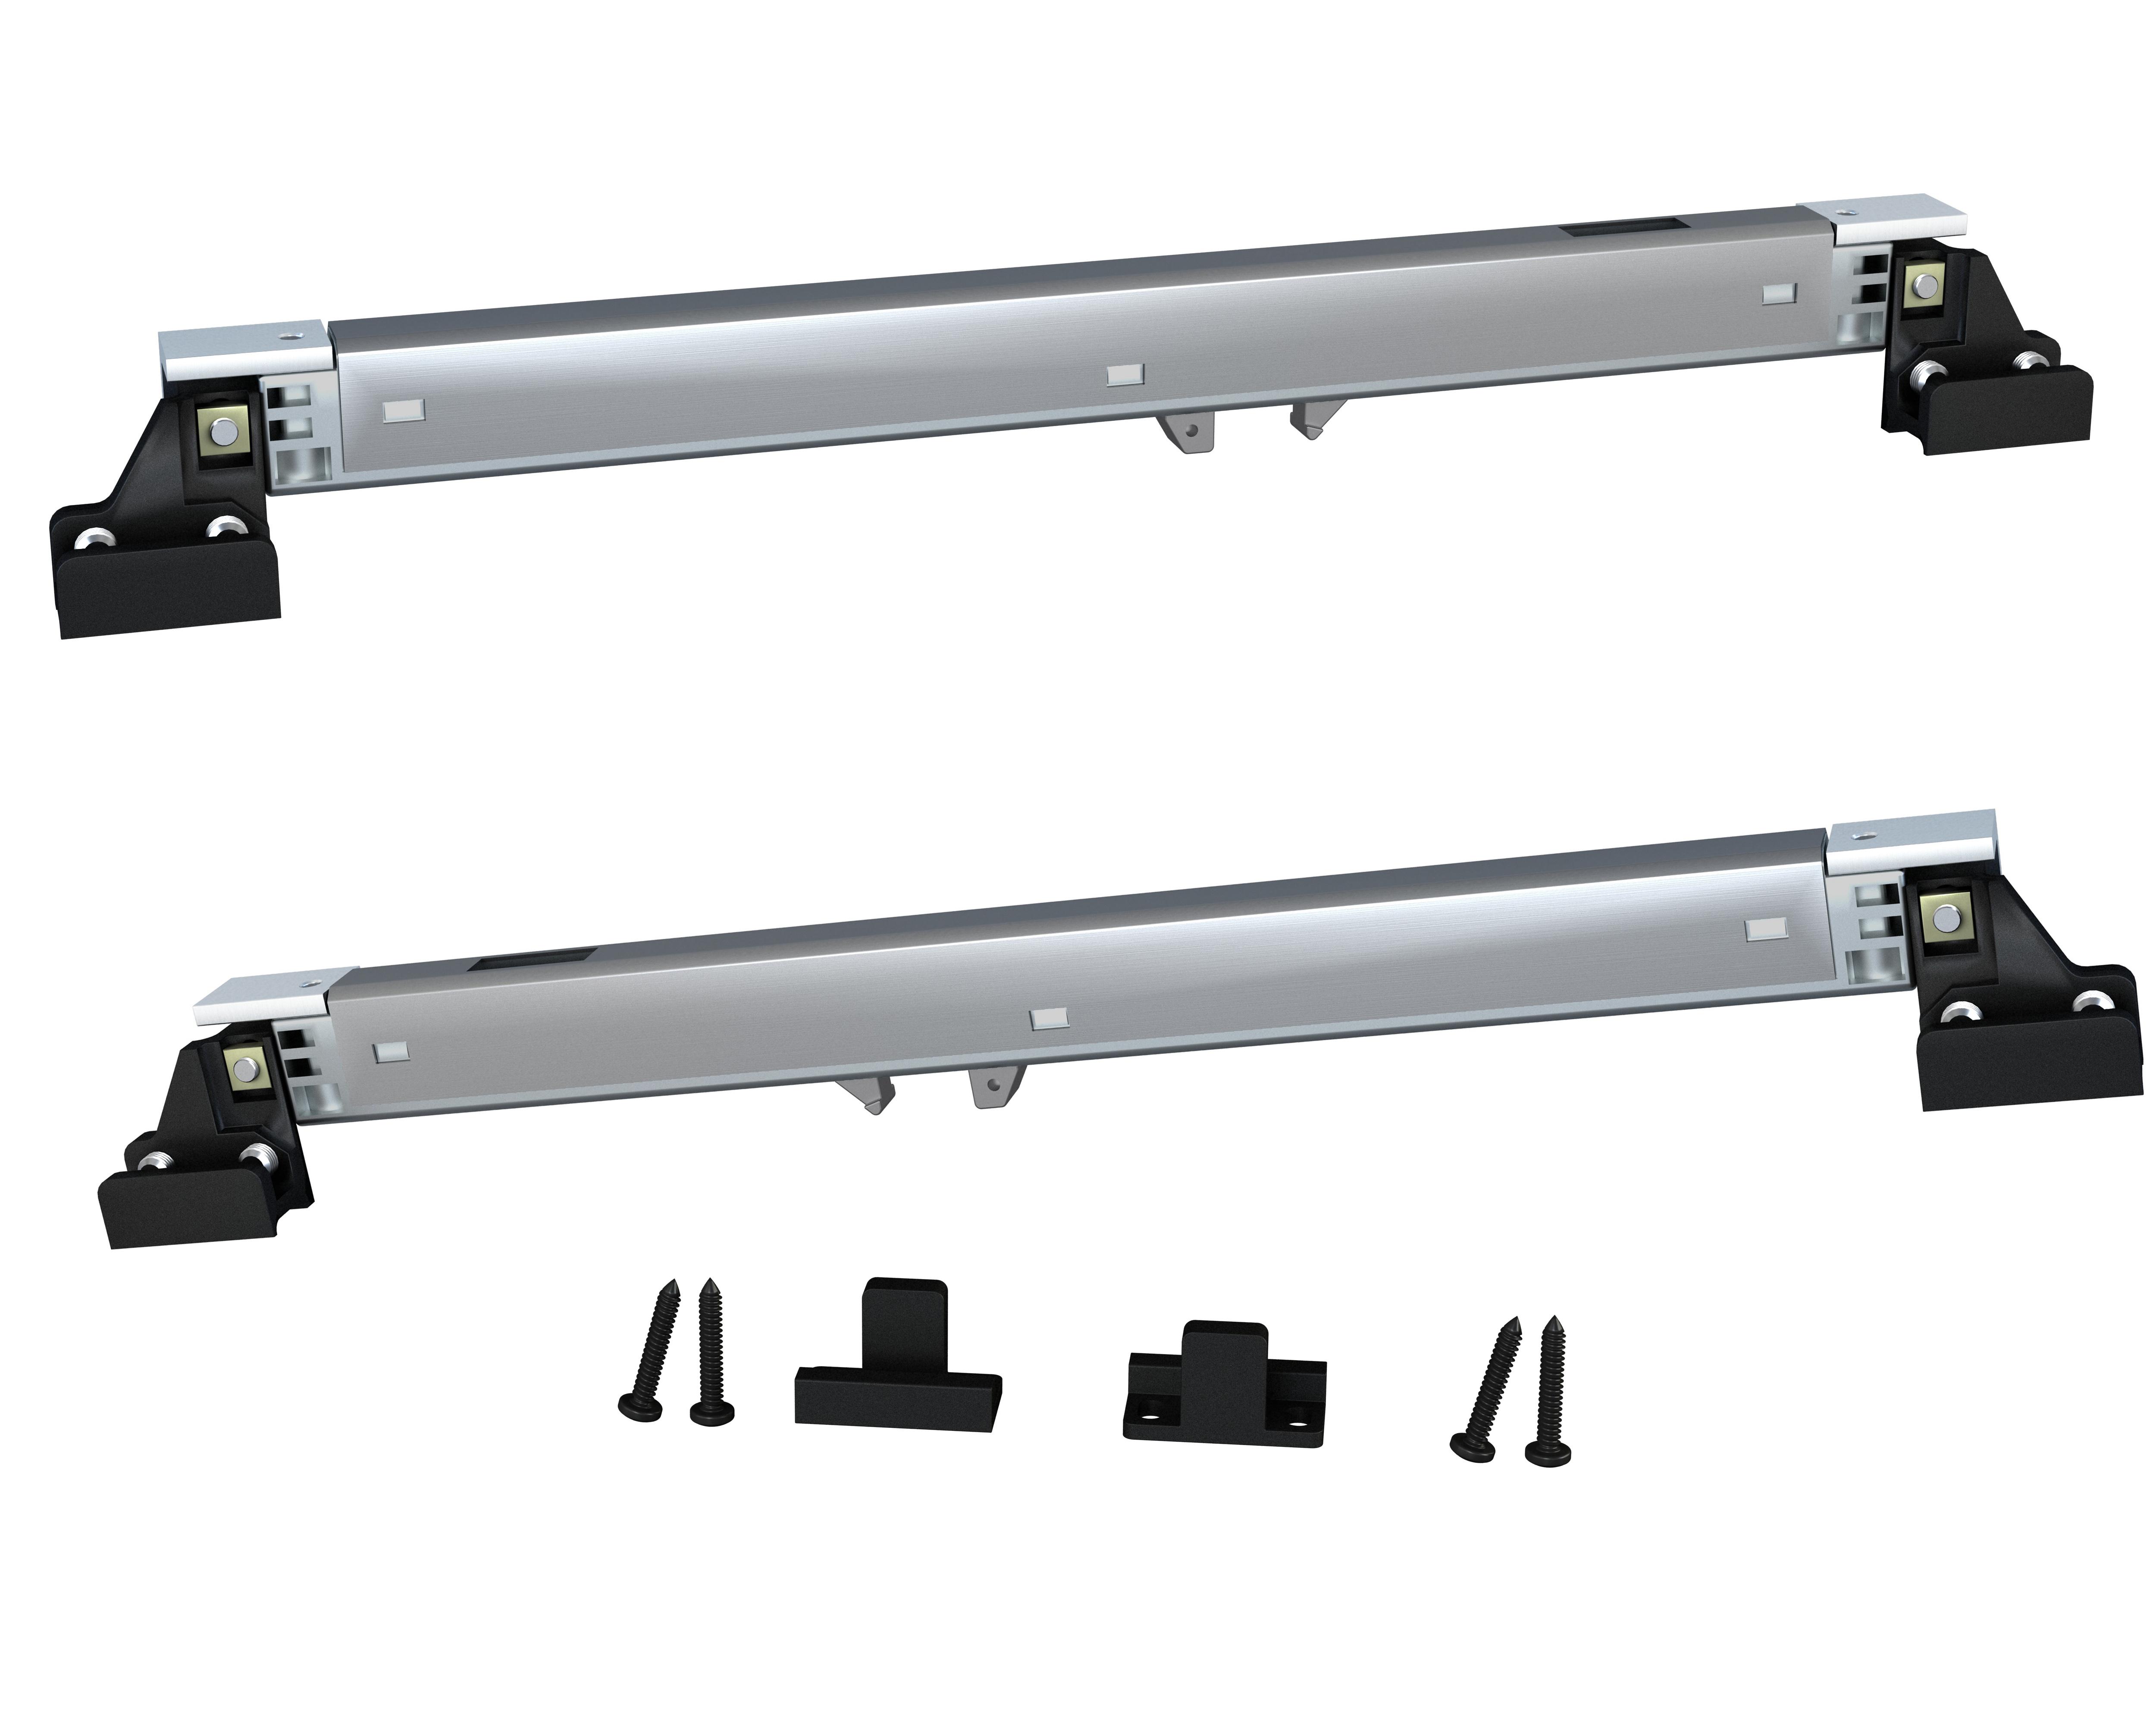 582e1575 New 'soft close' accessory added to Brio open bar rail 80 sliding door  hardware